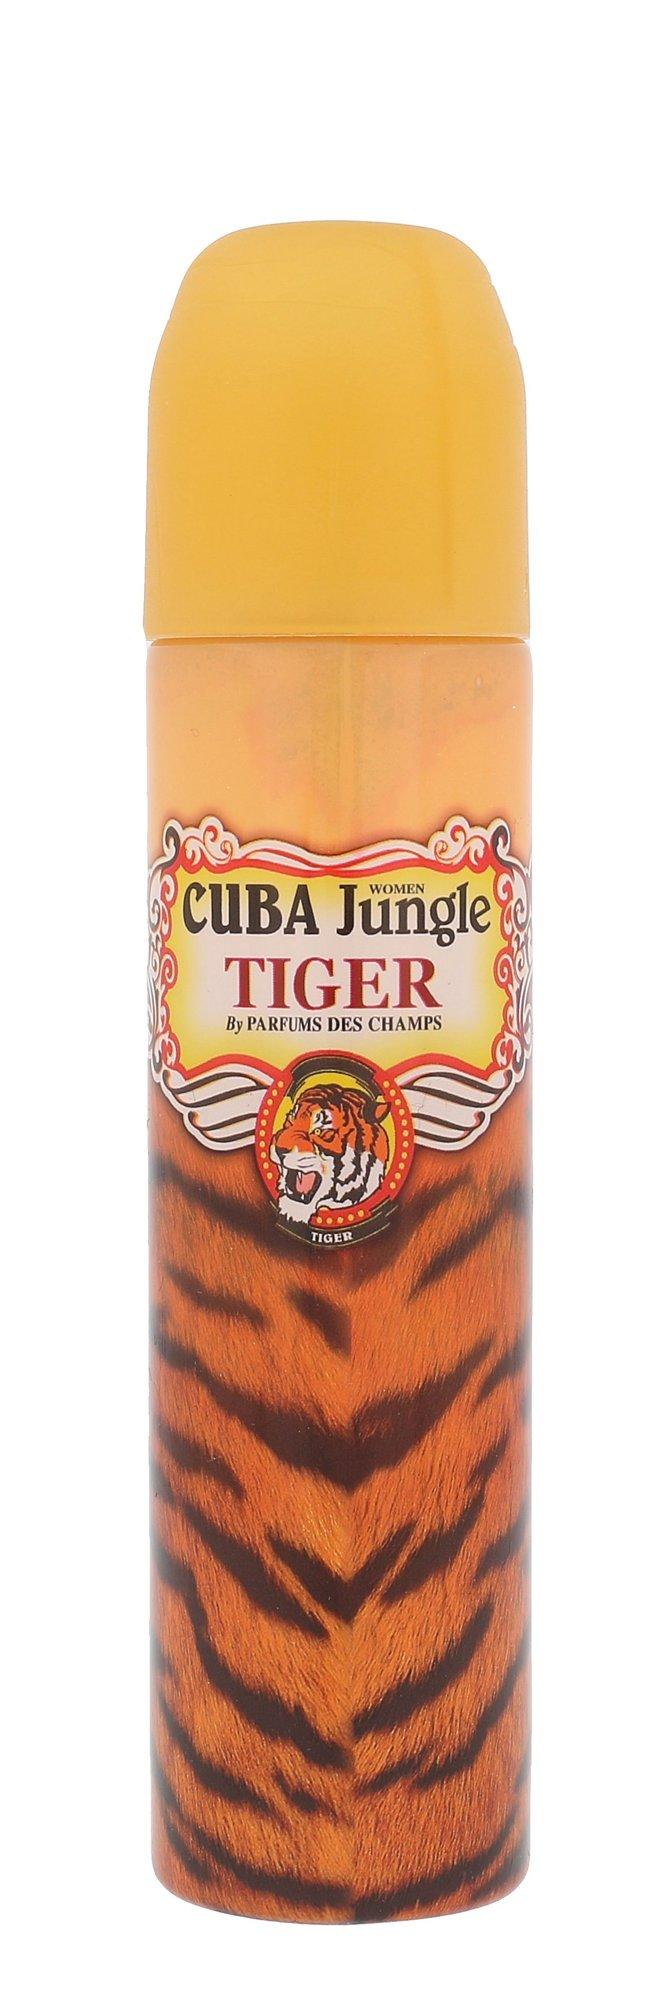 Cuba Tiger EDP 100ml